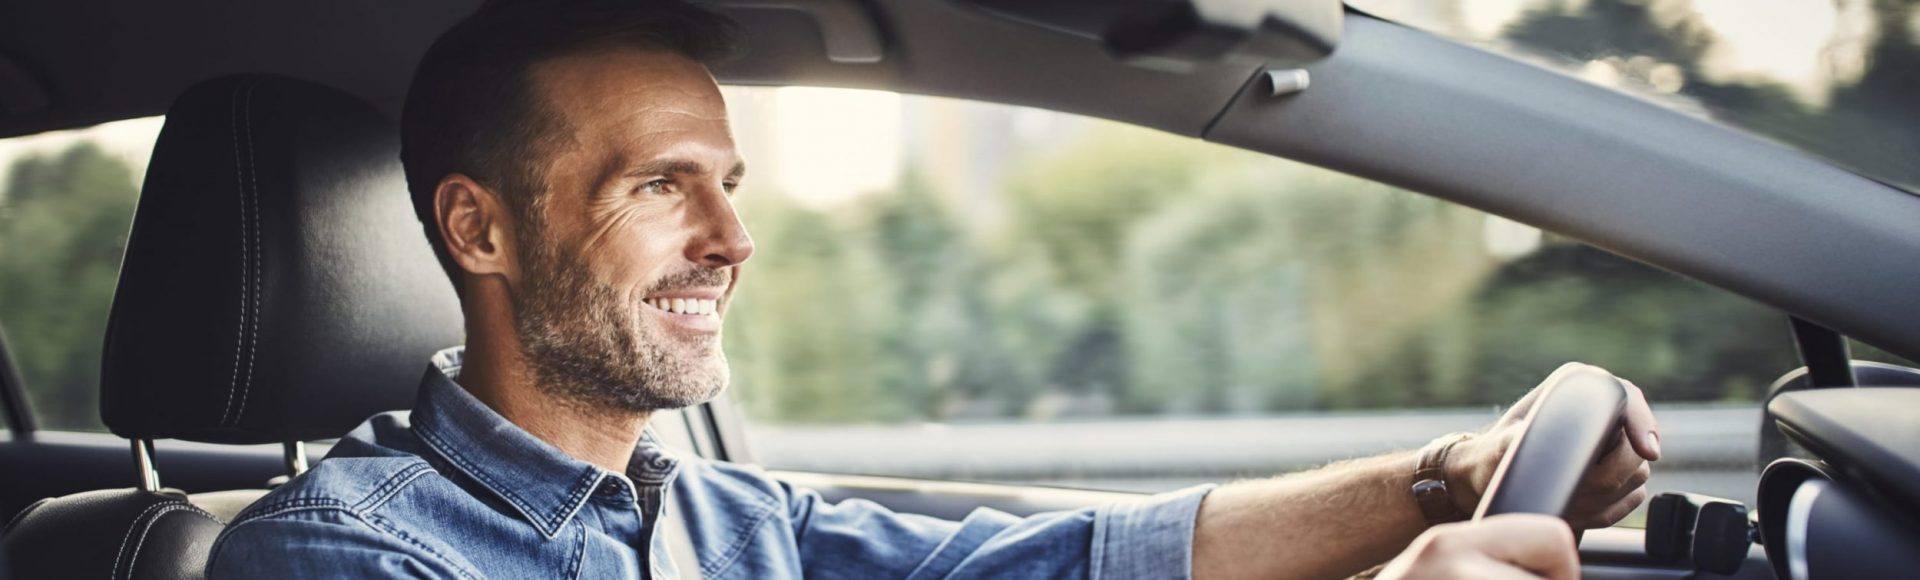 A man smiling driving a car